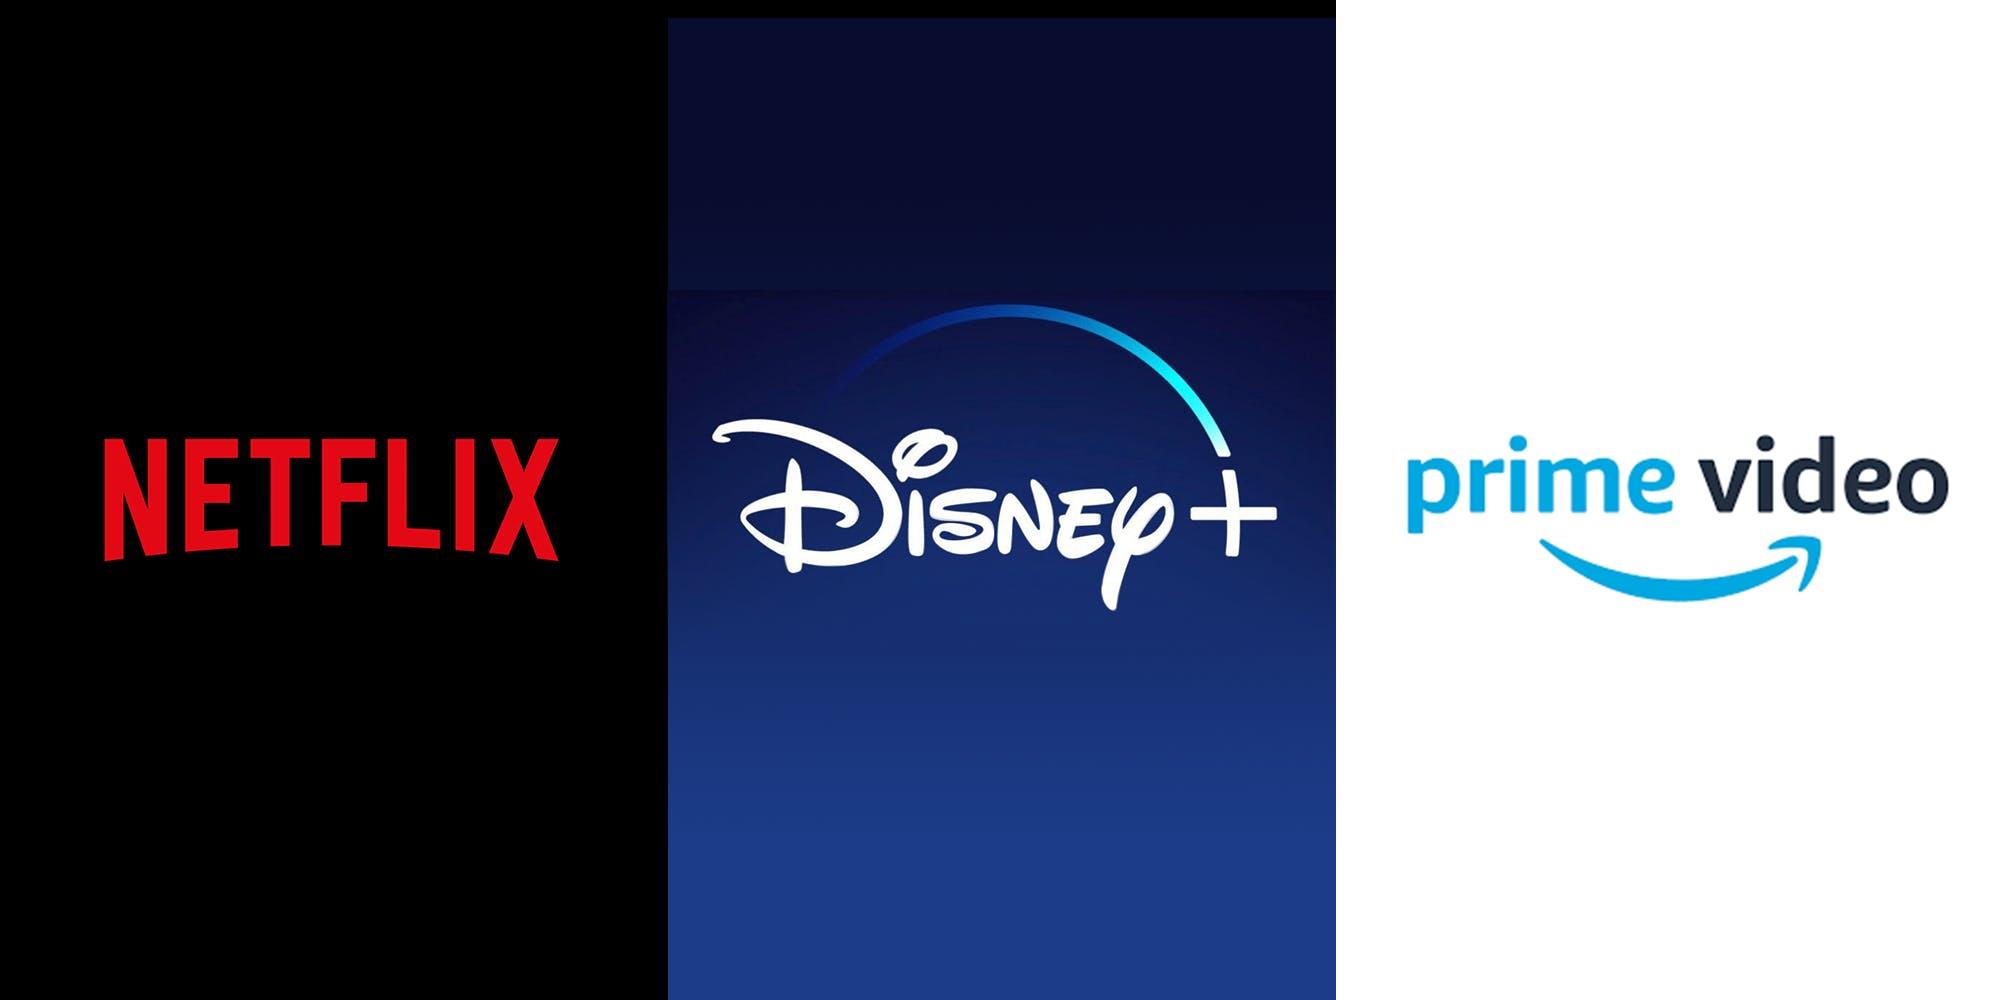 Netflix vs Disney Plus vs Amazon Prime: The battle of the video streaming services